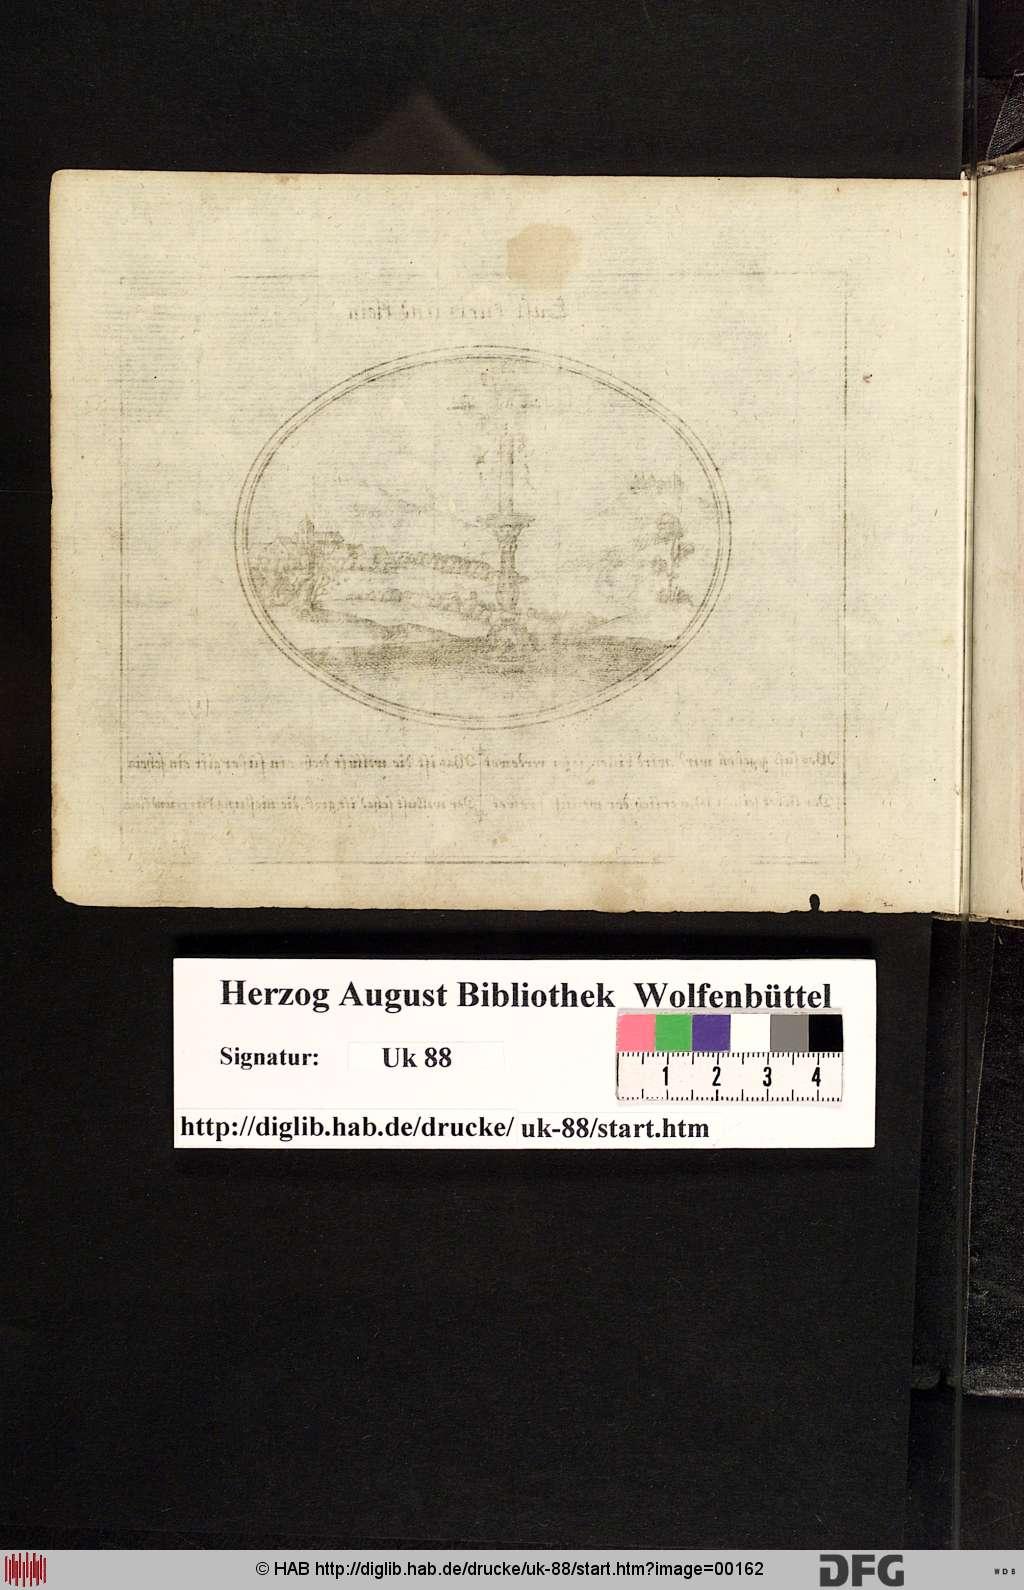 http://diglib.hab.de/drucke/uk-88/00162.jpg